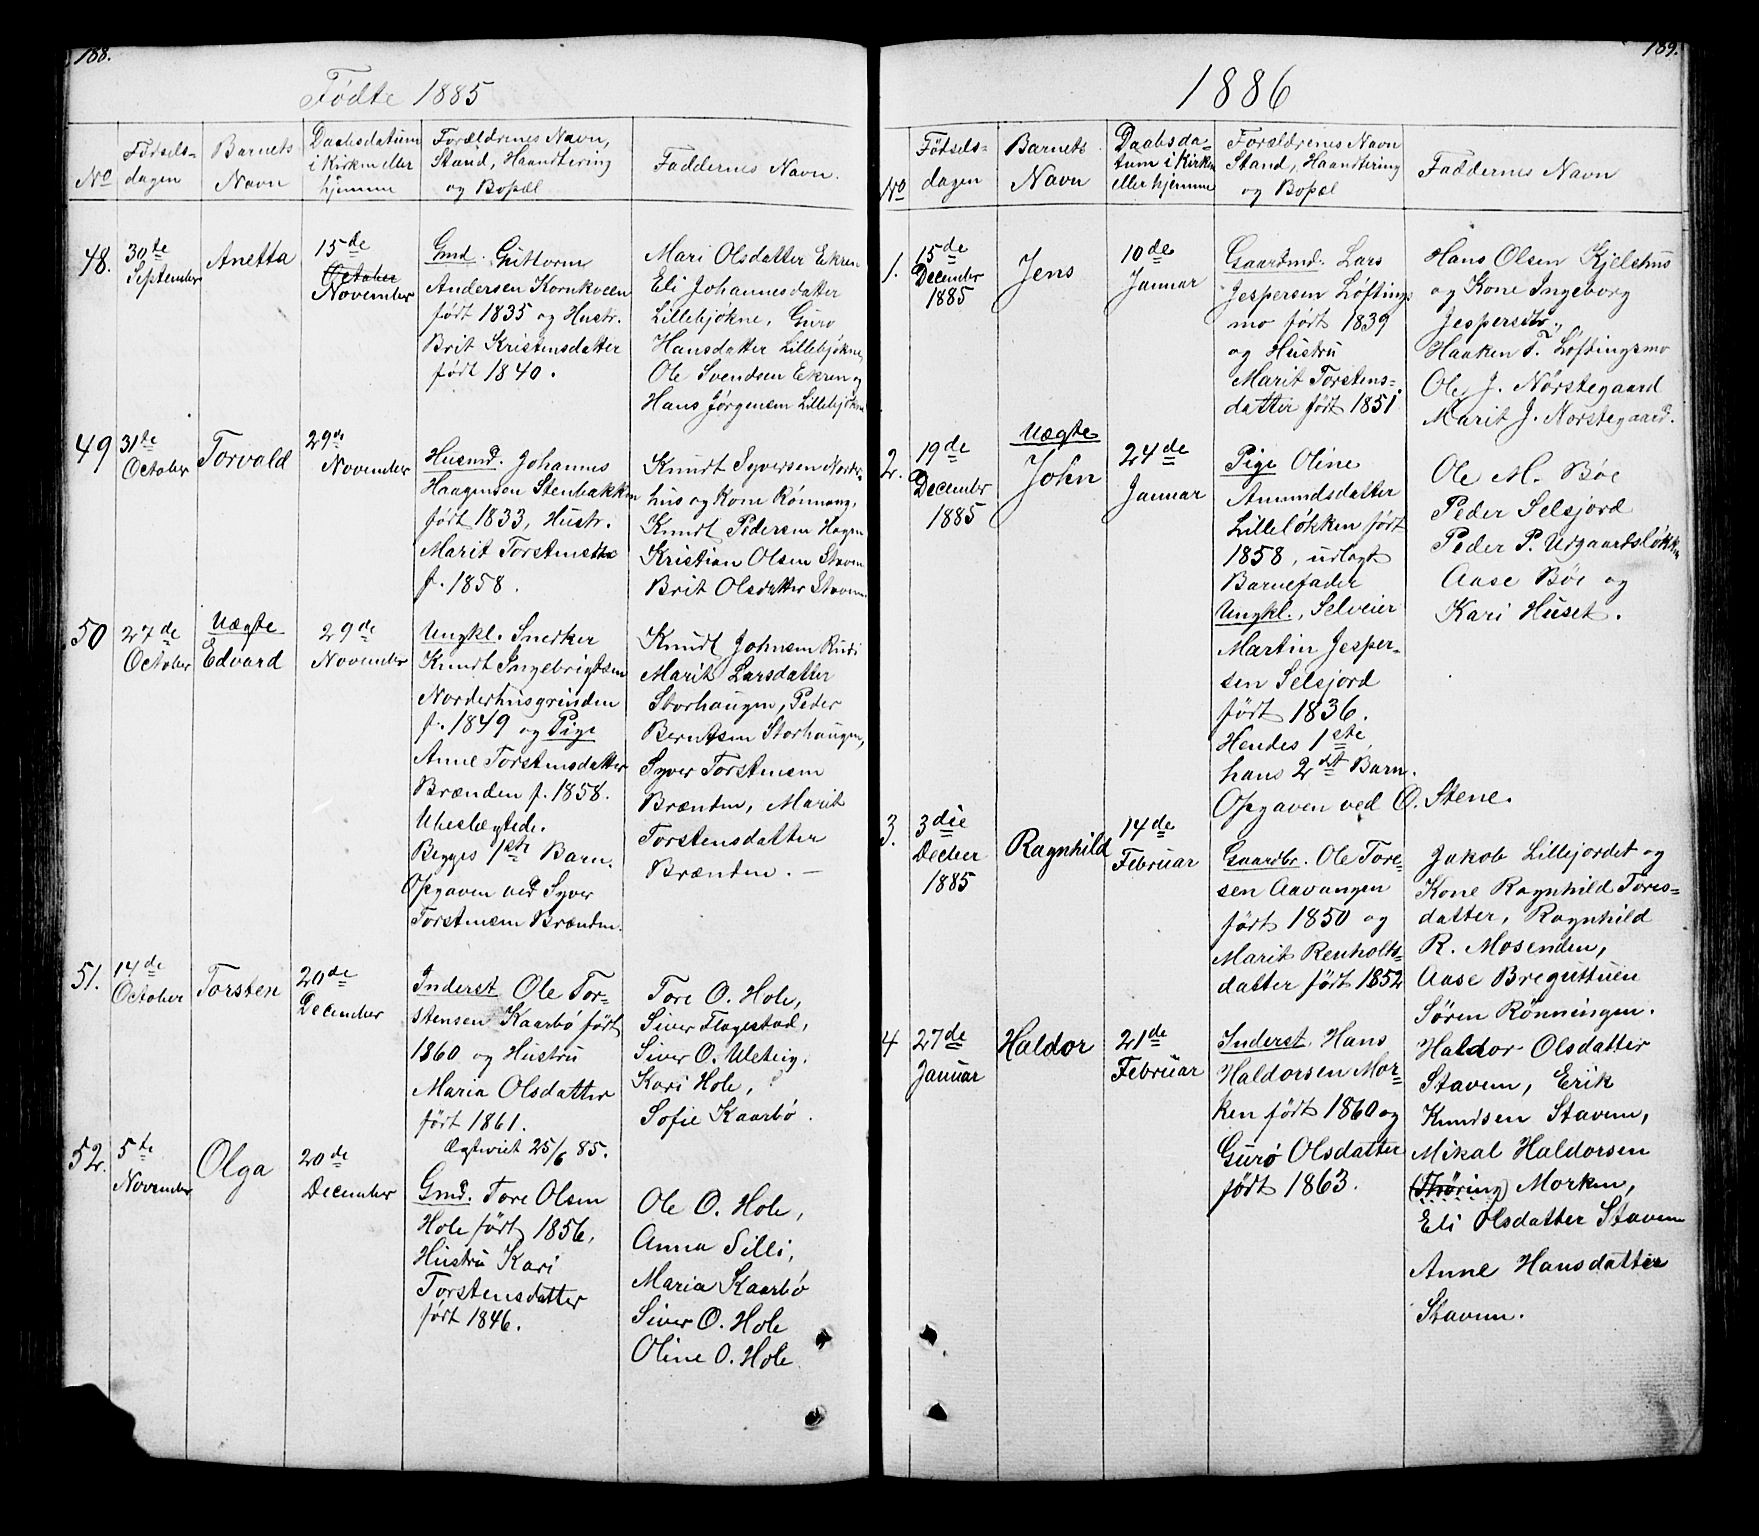 SAH, Lesja prestekontor, Klokkerbok nr. 5, 1850-1894, s. 188-189